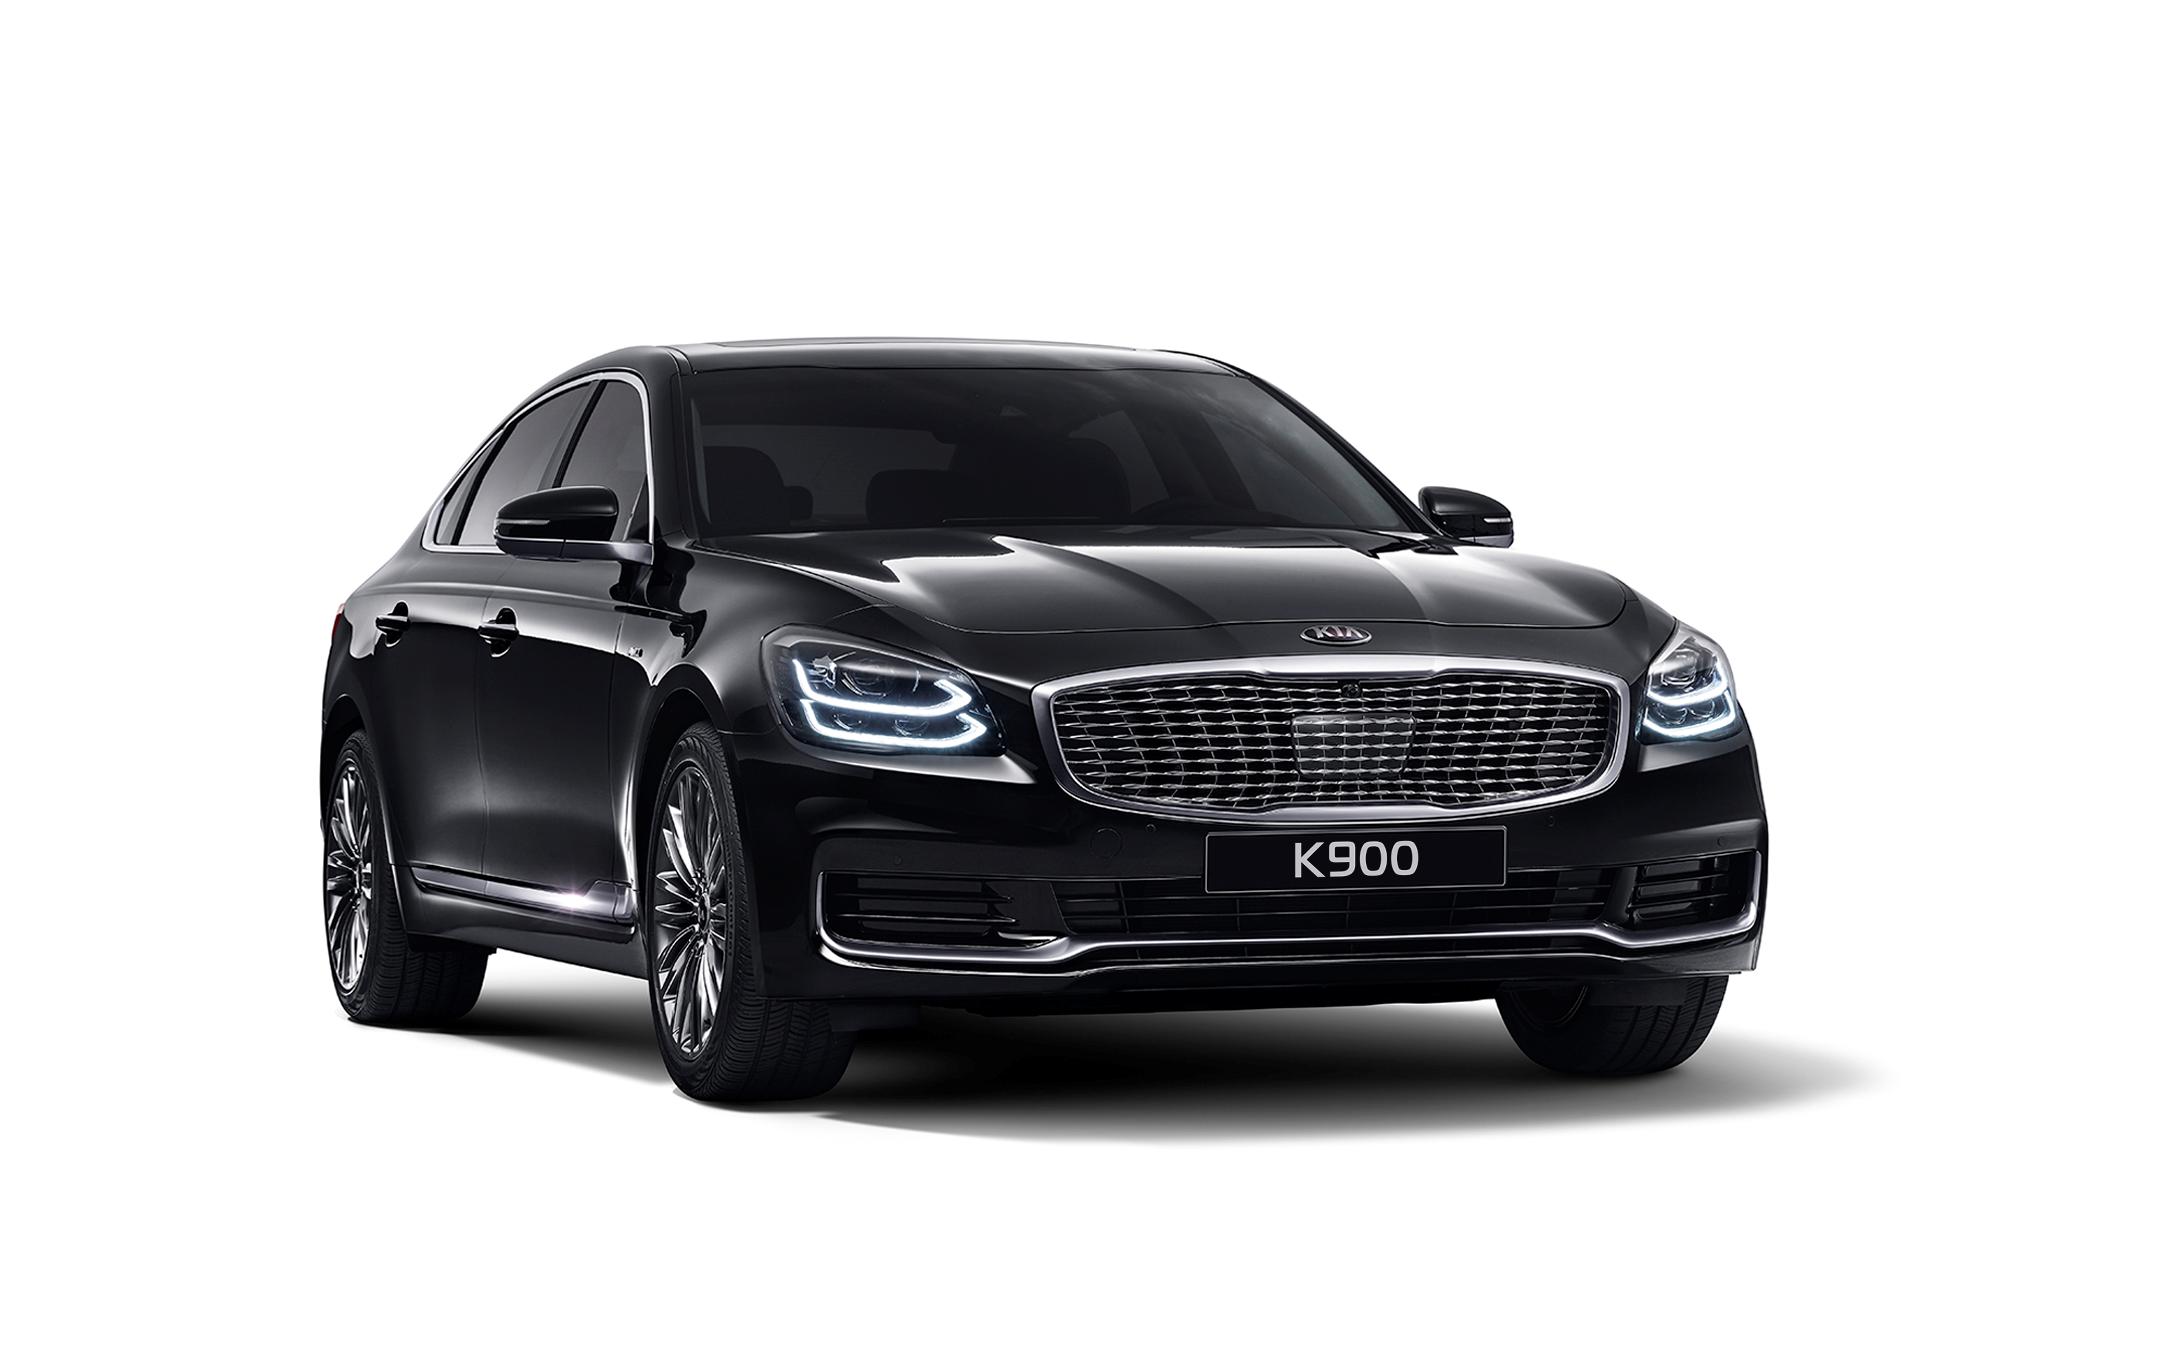 Luxury Vehicle: Next-Gen Kia K900 To Debut At New York International Auto